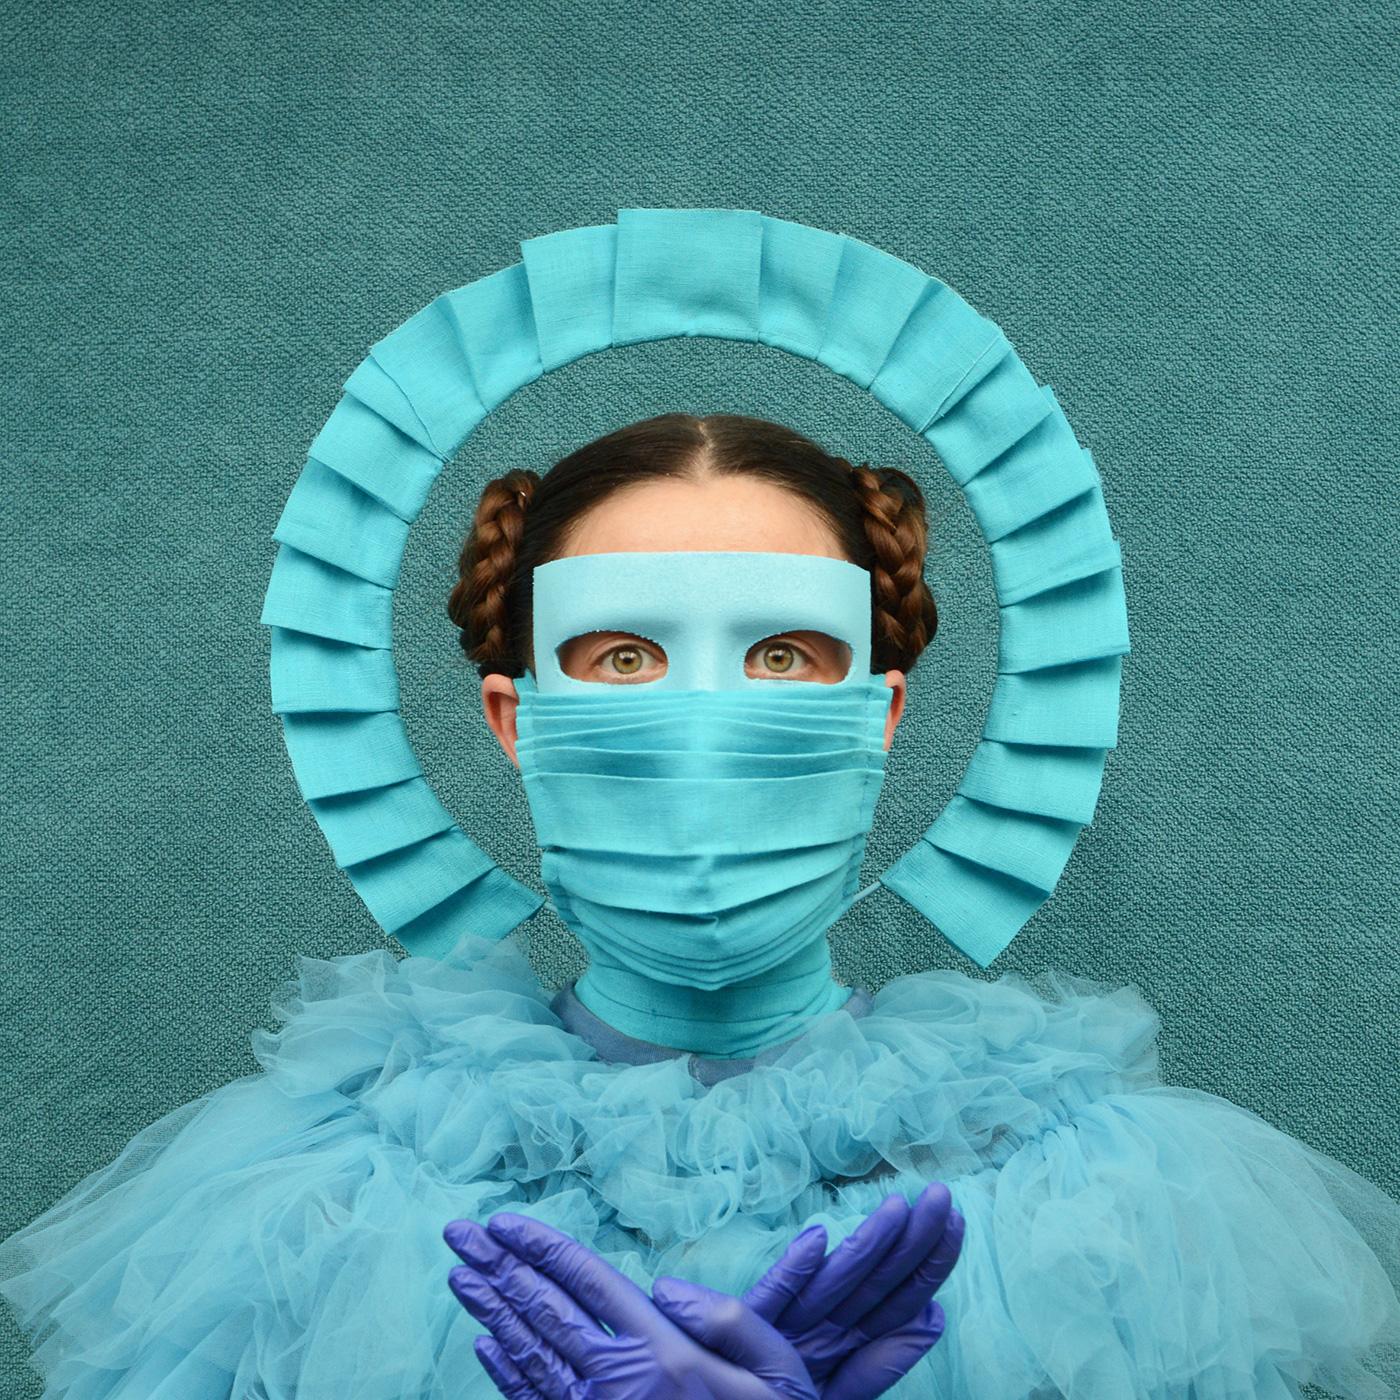 Freyja Sewell designed mask